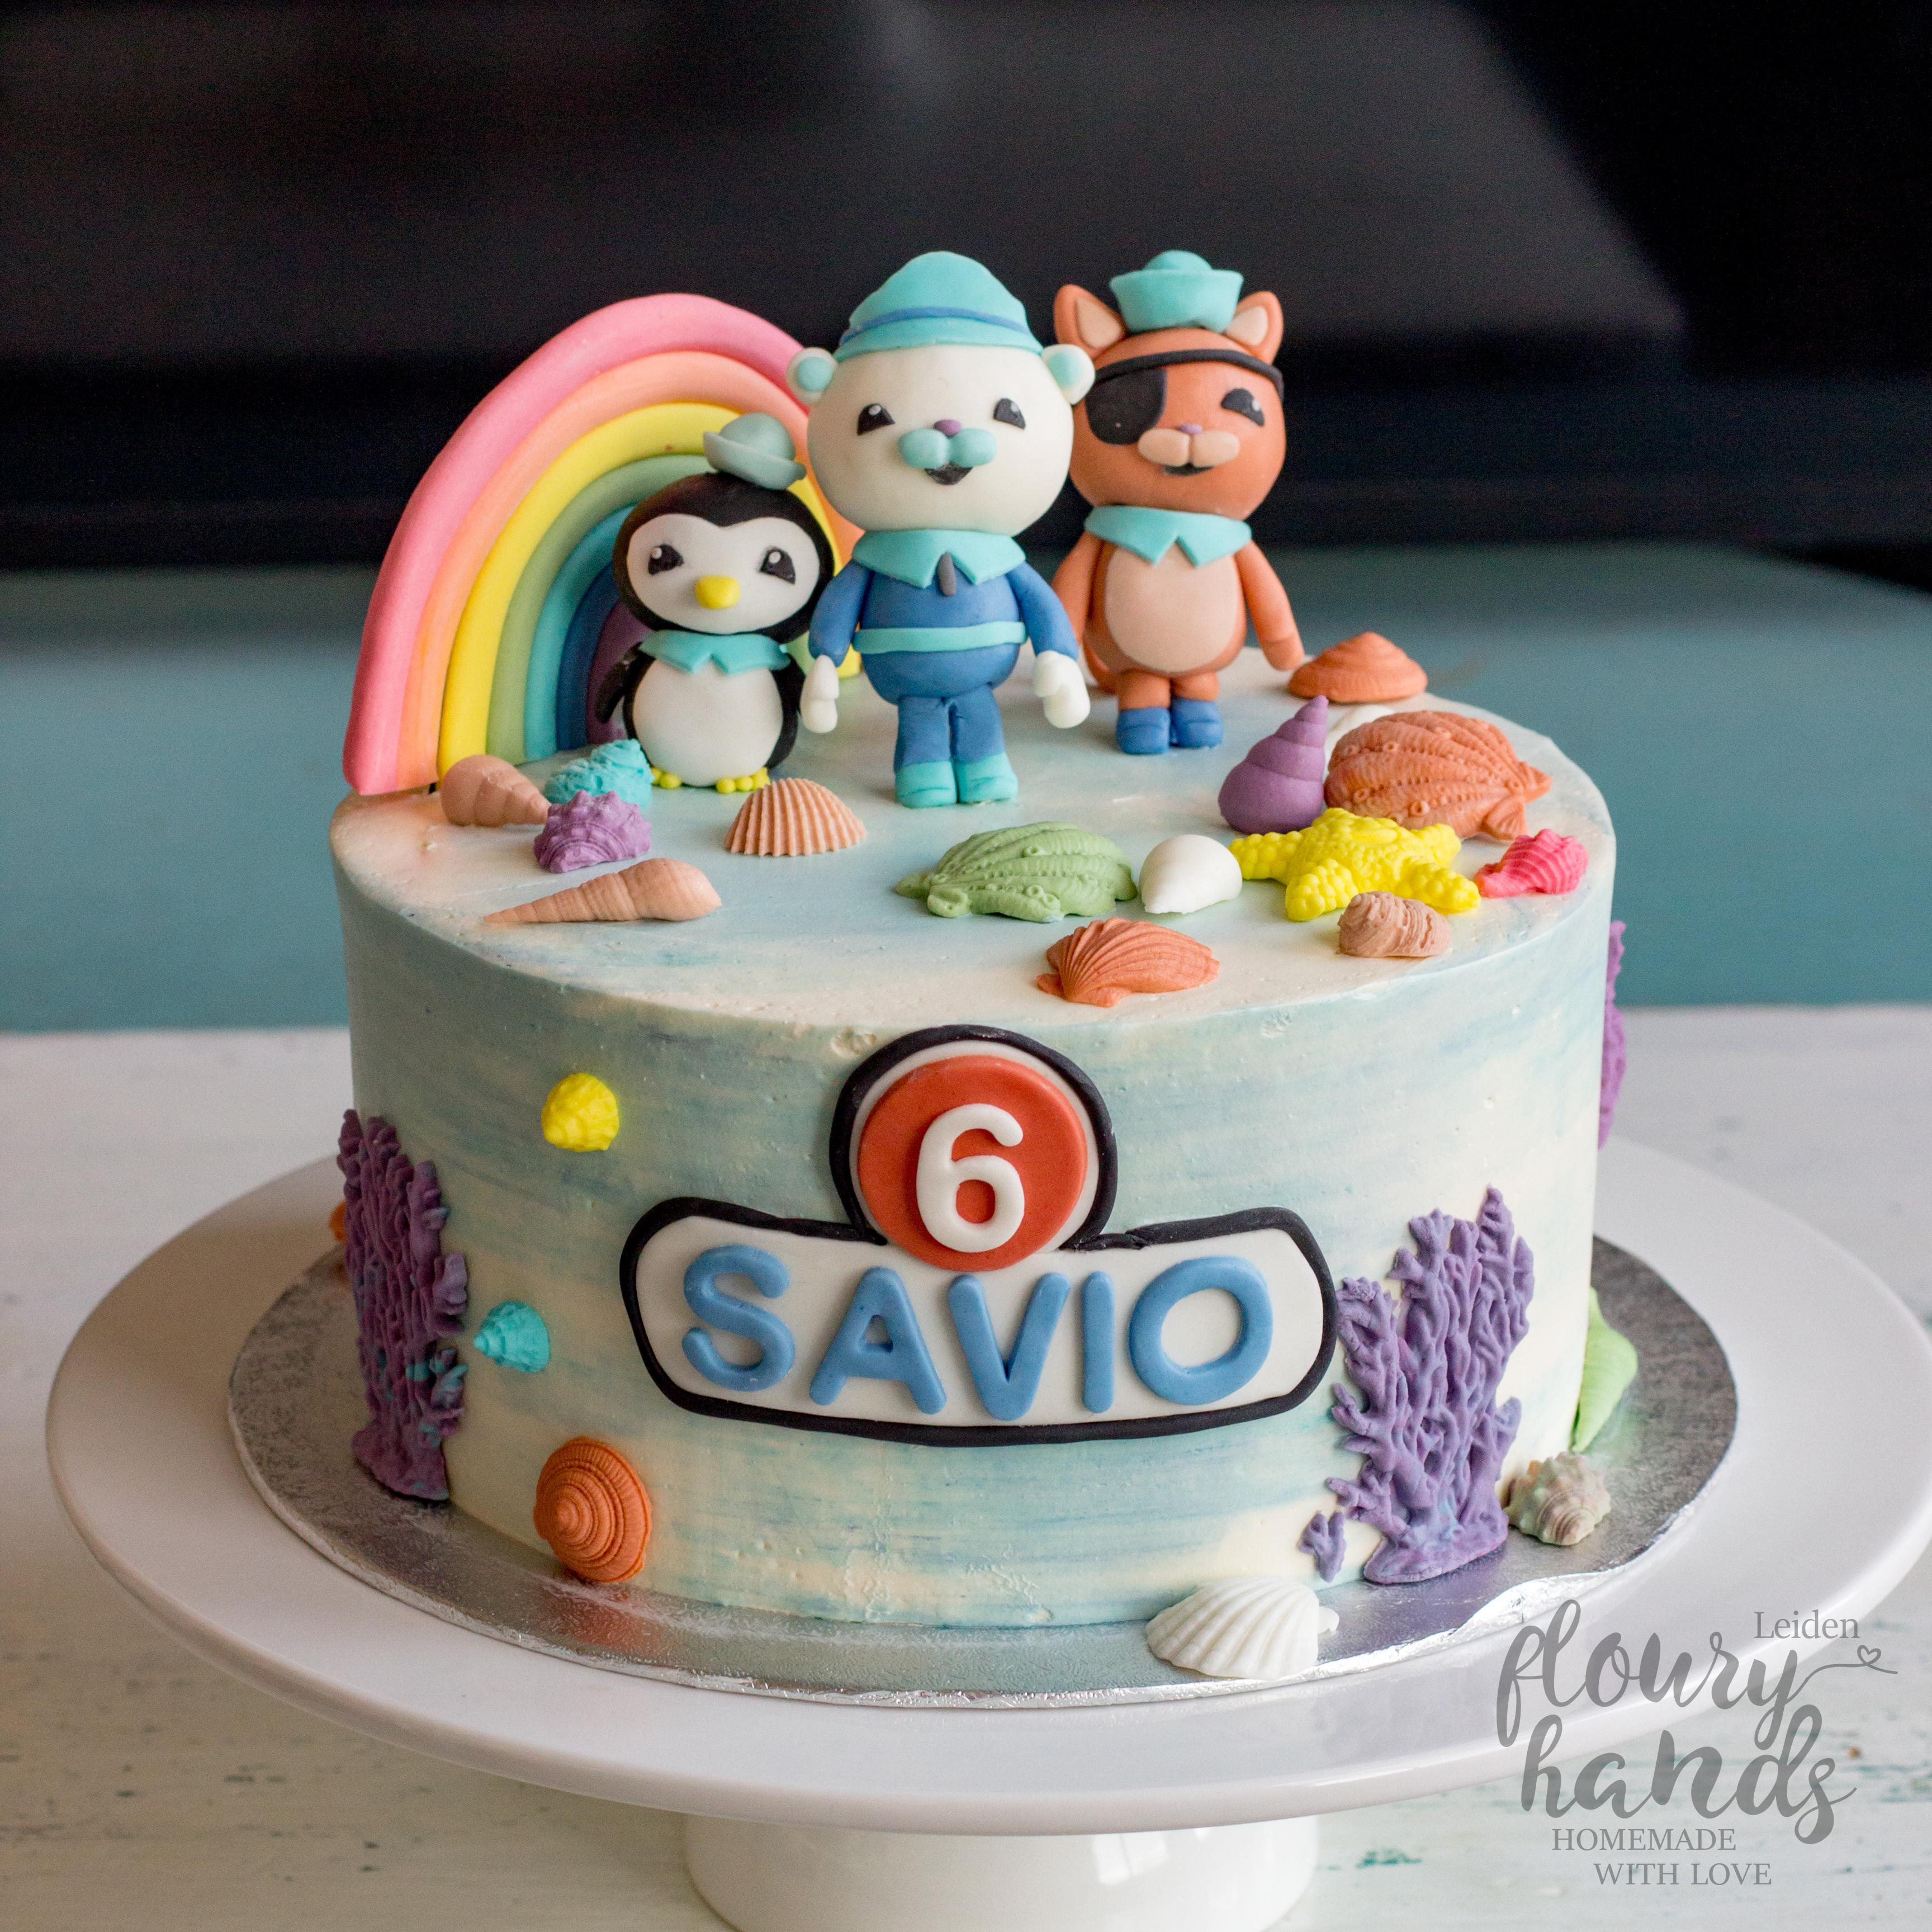 Octonauts And Rainbow Birthday Cake Floury Hands